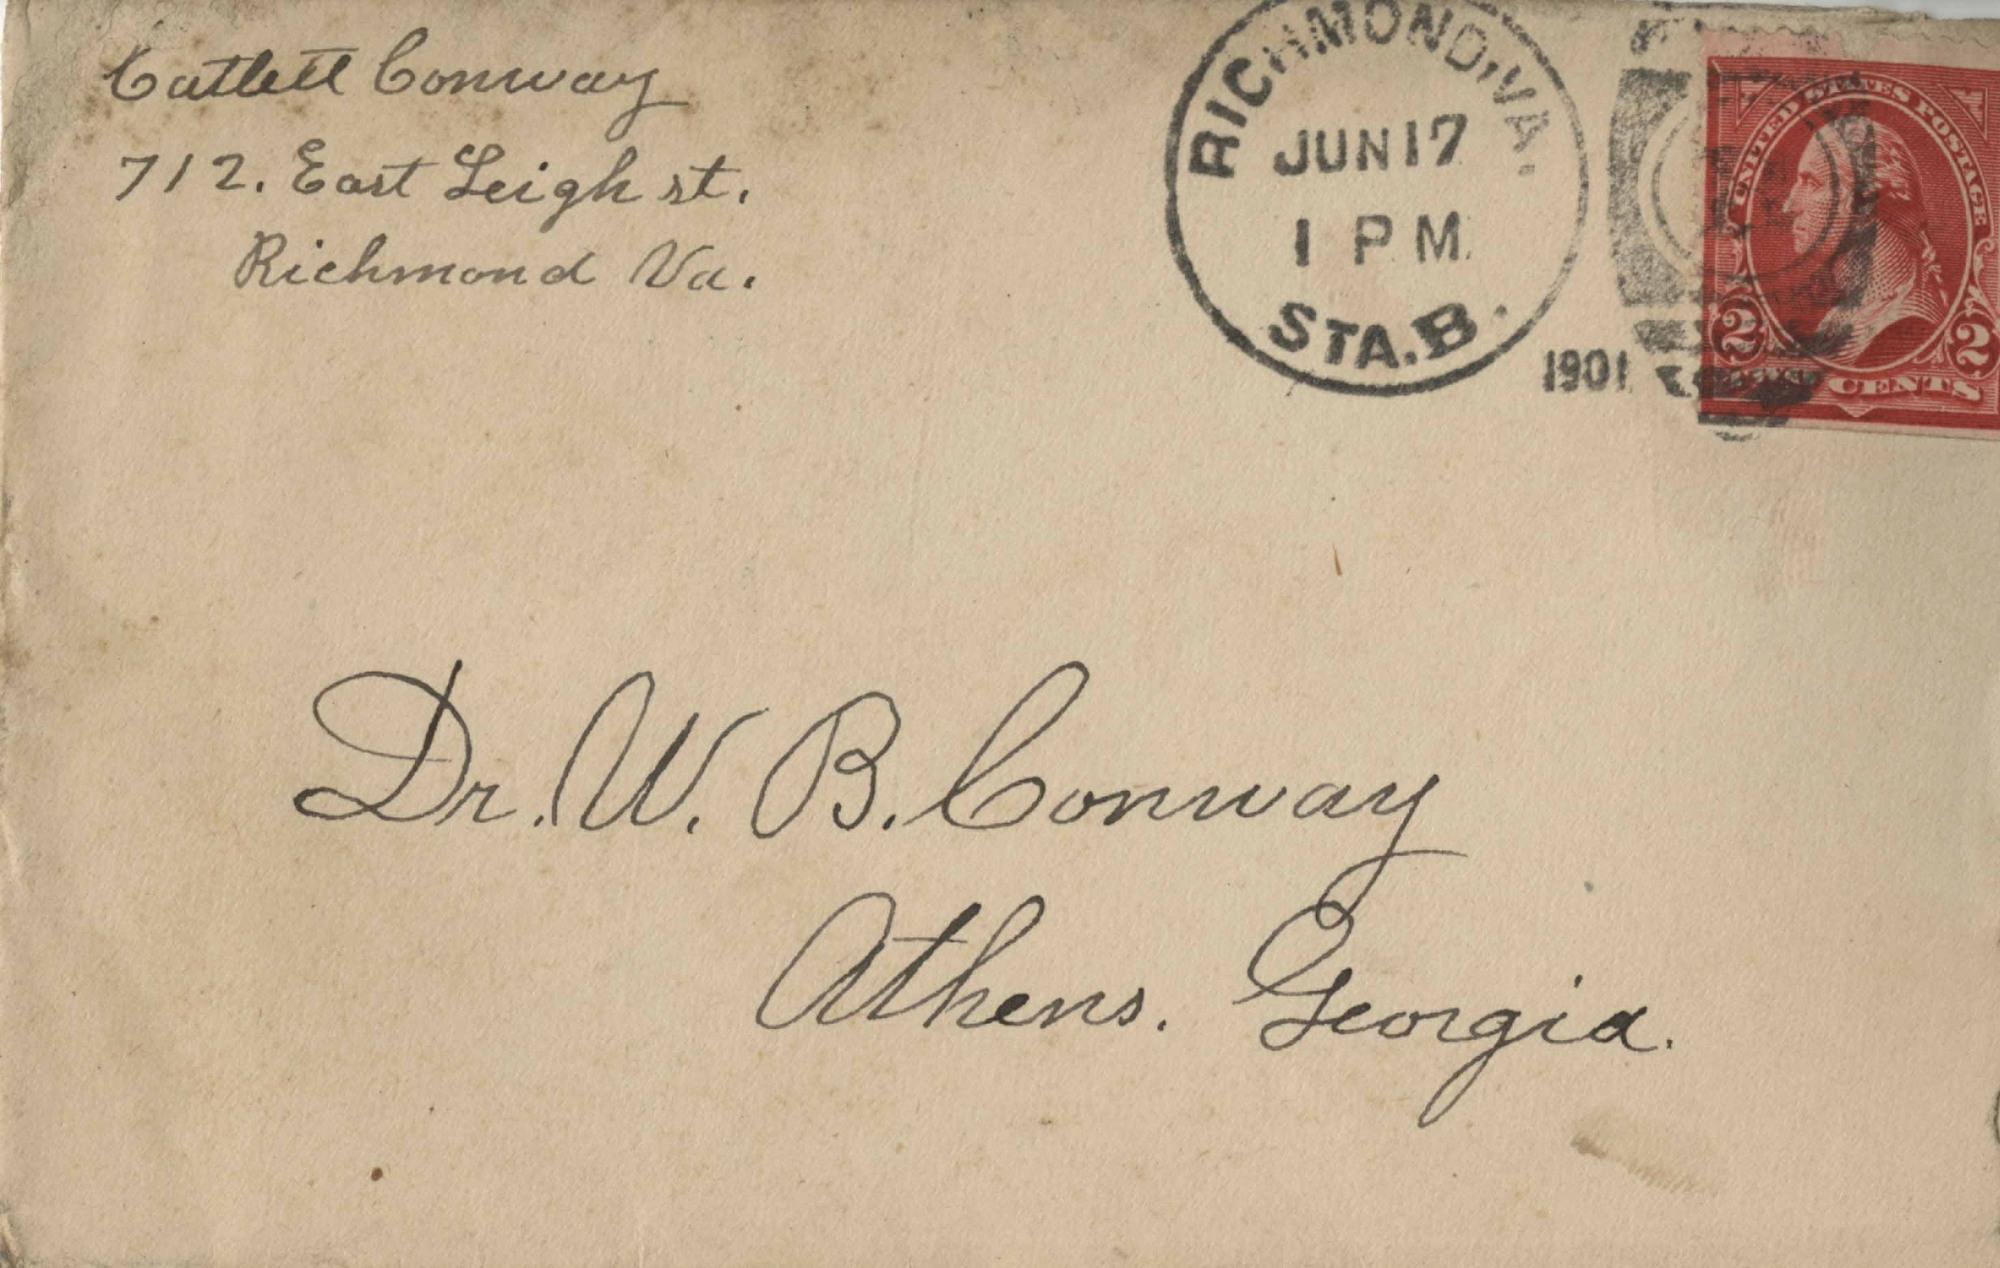 http://spec.lib.vt.edu/pickup/Omeka_upload/Ms2012-039_ConwayCatlett_F3_Letter_1901_0616_enva.jpg